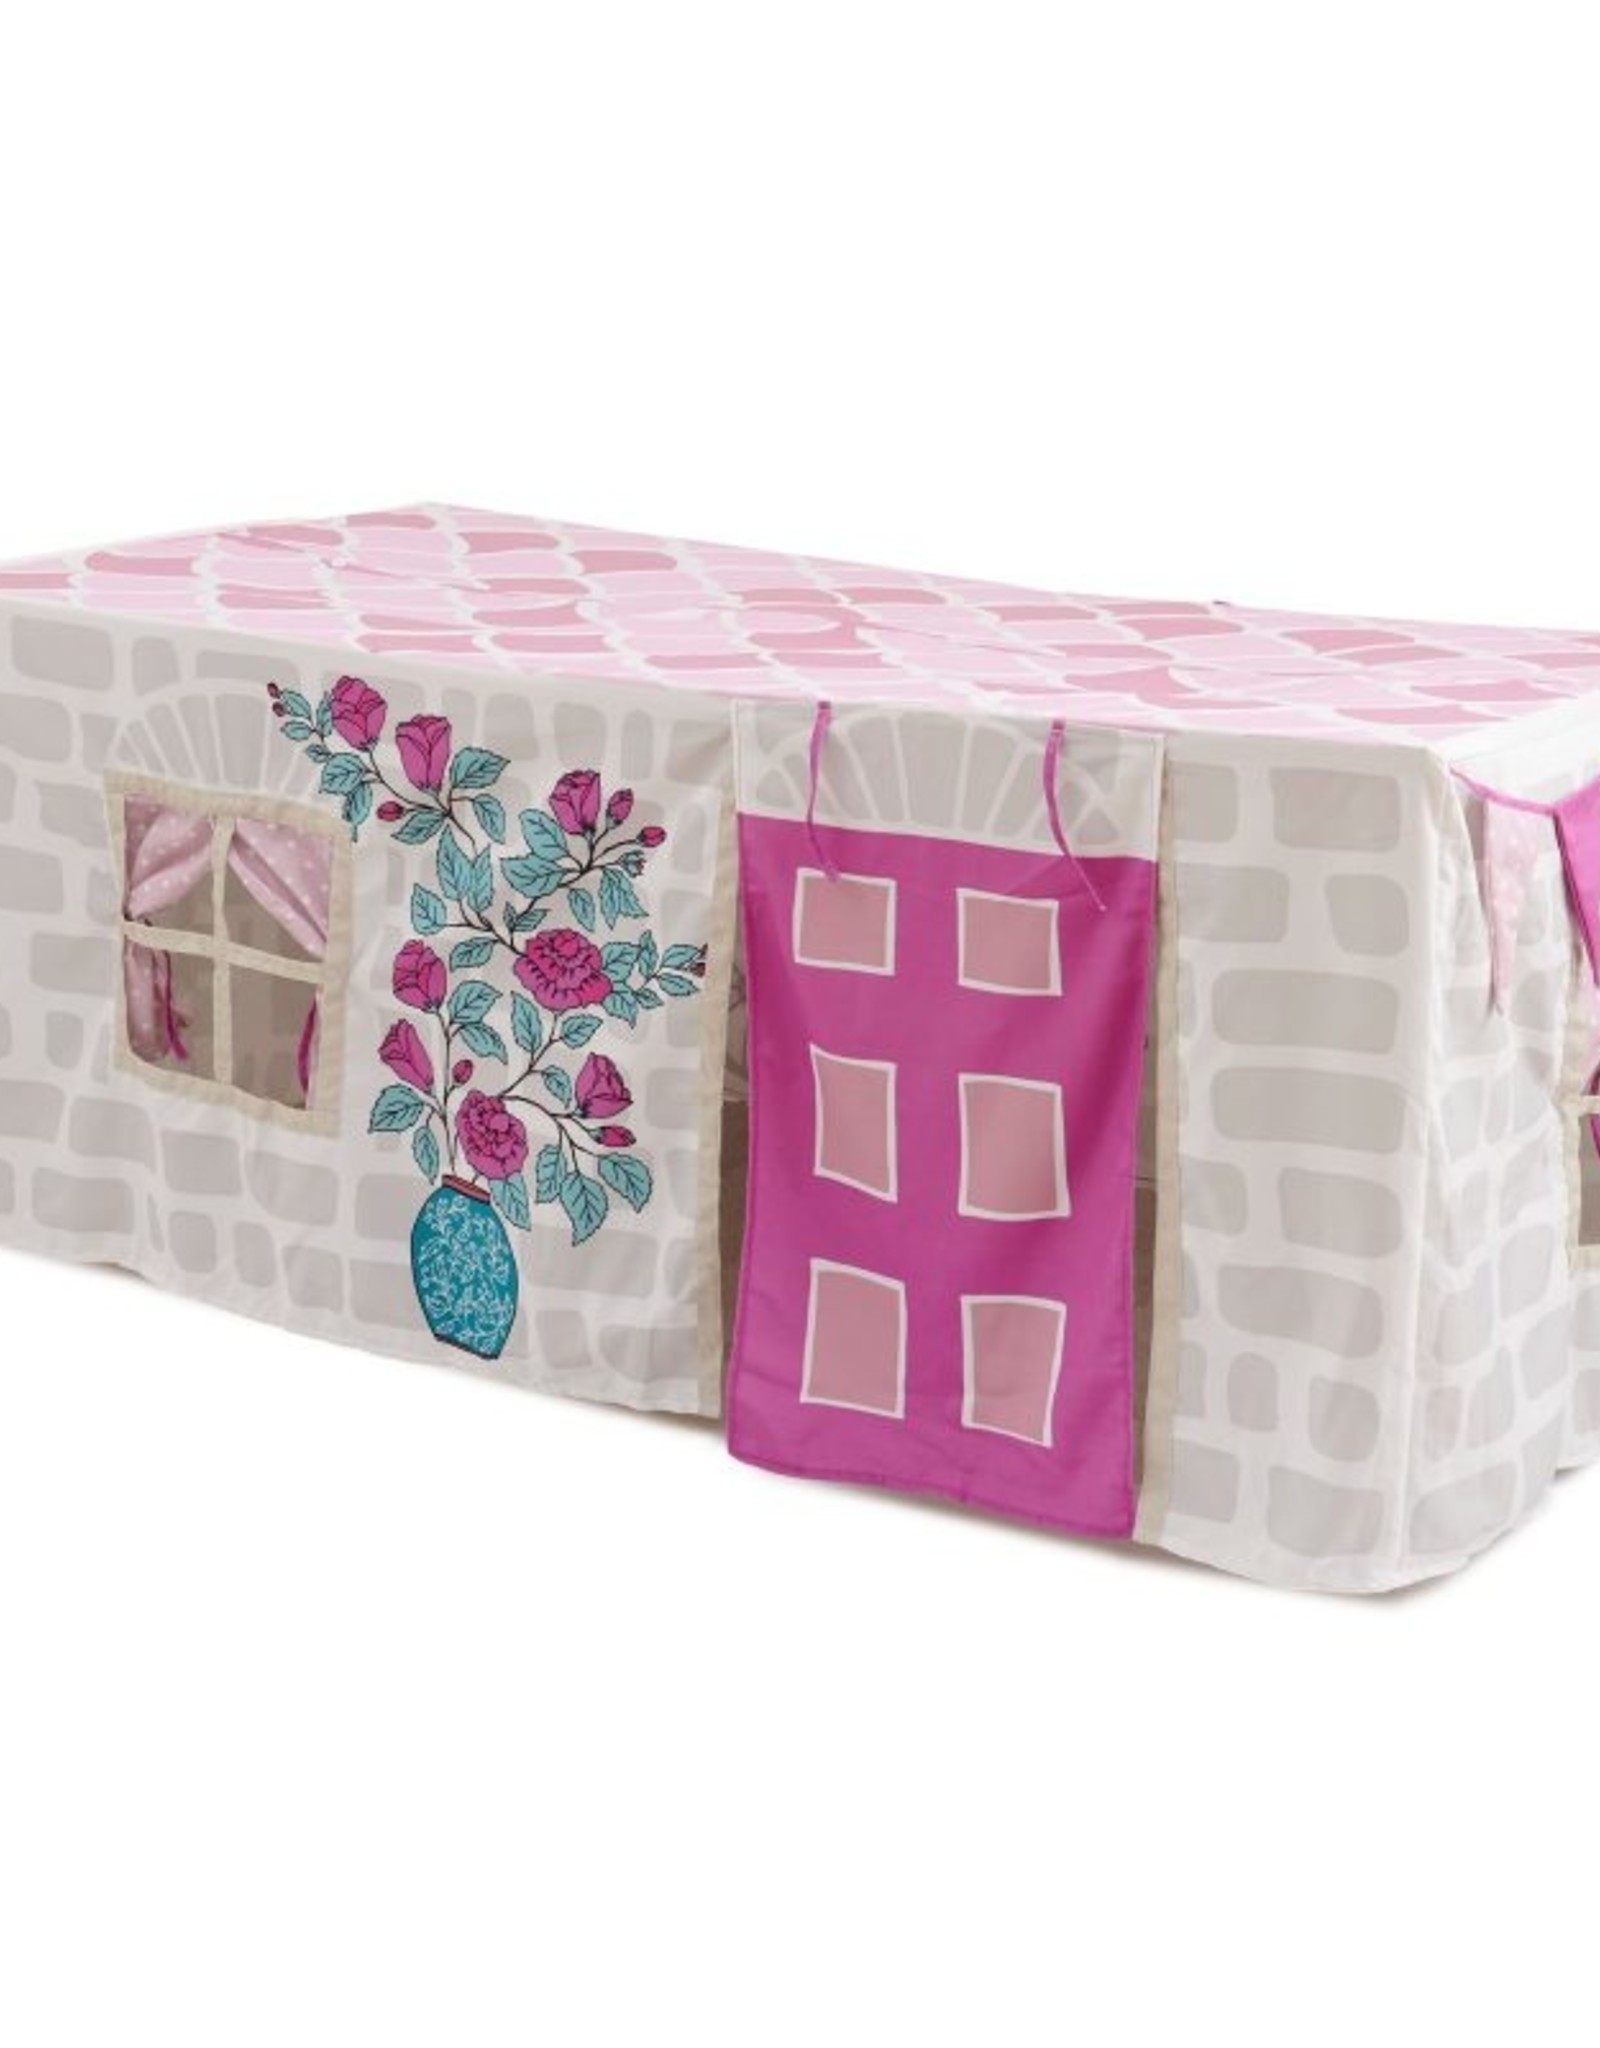 Petit Maison Play Petite Maison Play - Home Sweet Home